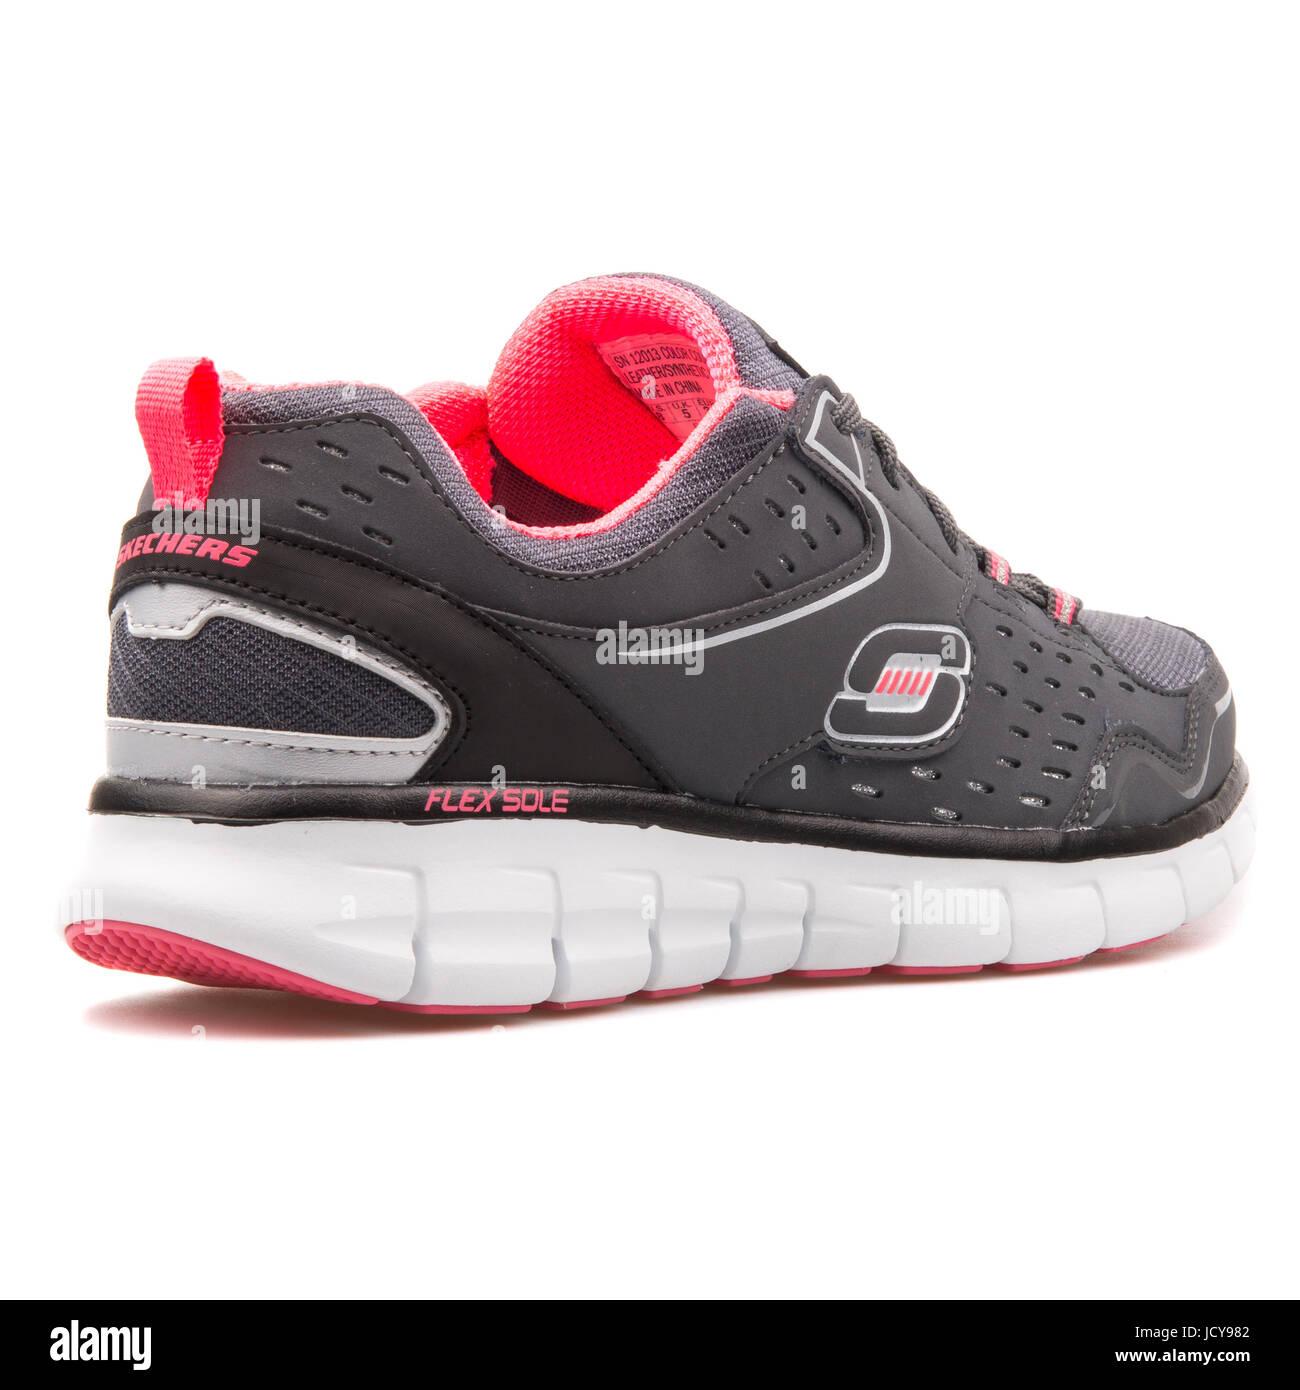 Skechers Synergy-Front riga nero carbone donna scarpe running - 12013-CCBK Immagini Stock